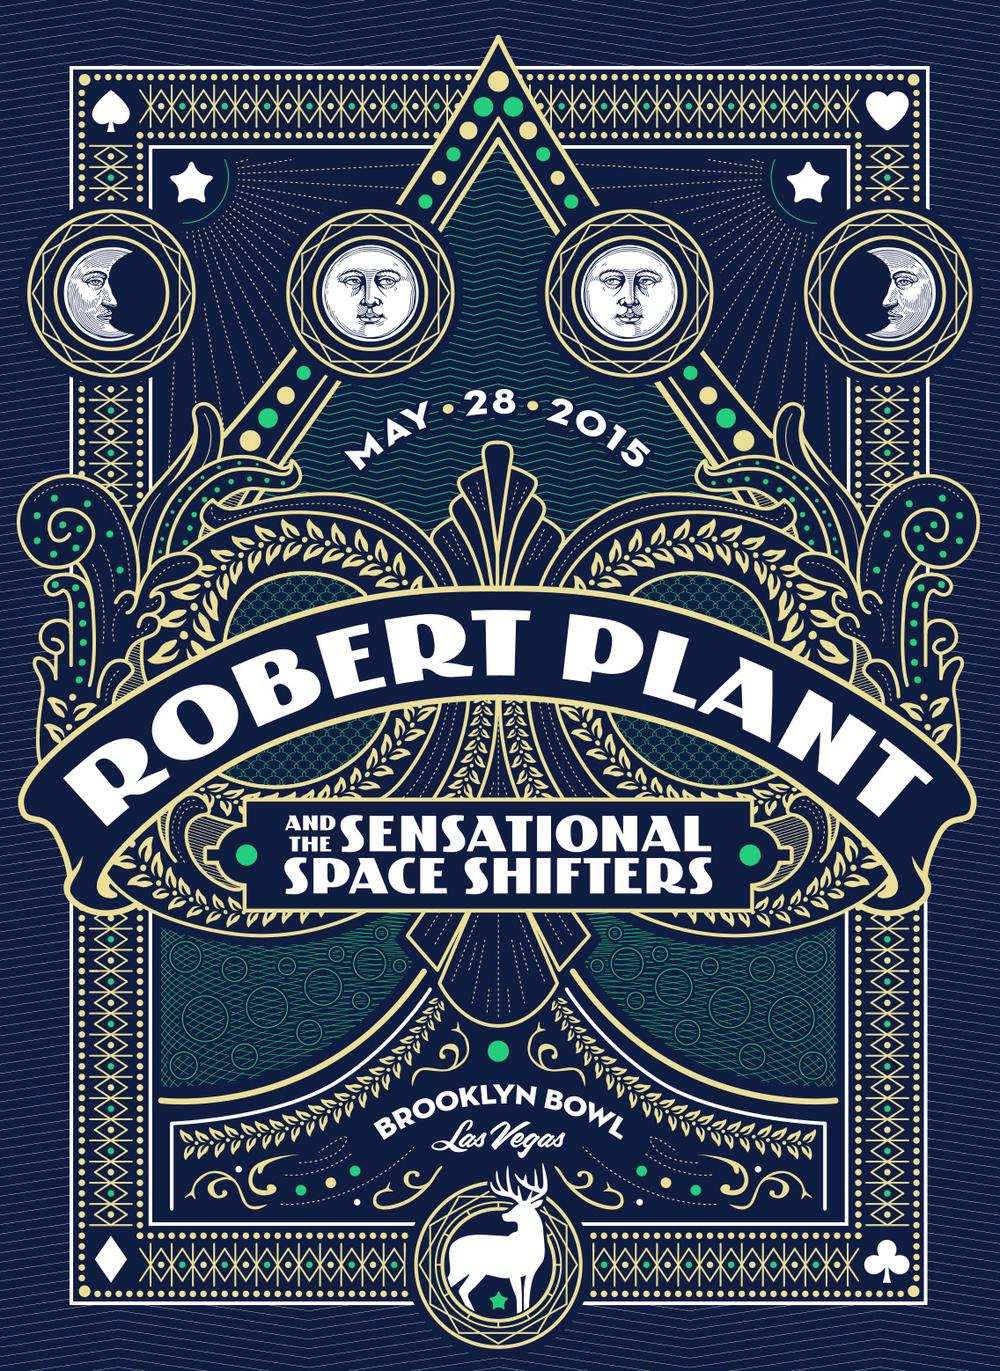 robertplant.jpg